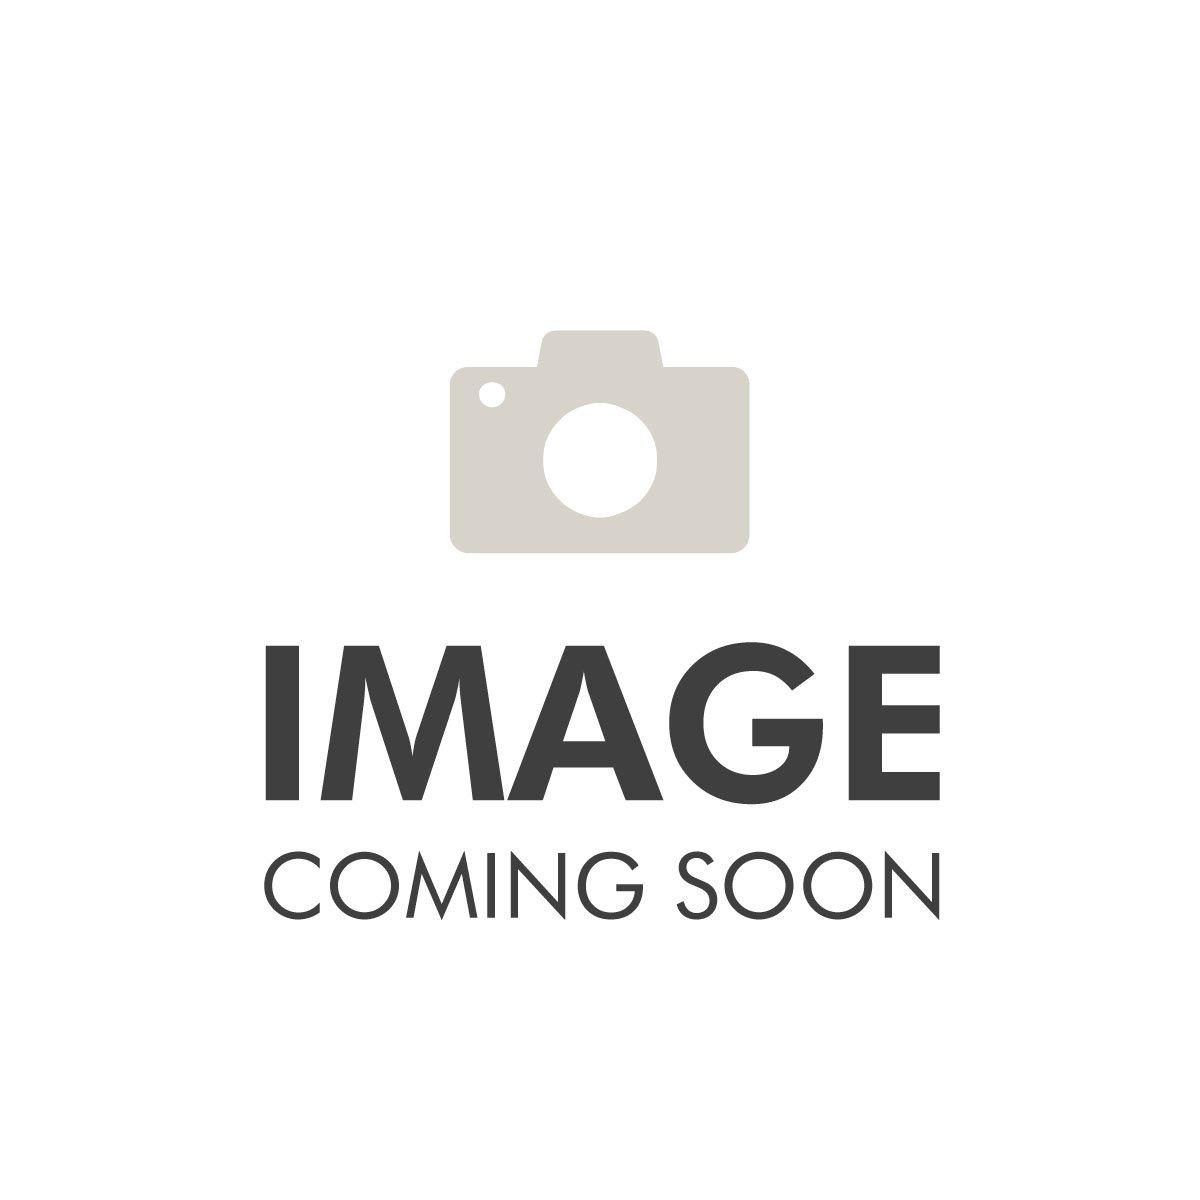 Lancaster 365 Set Day Cr 50+Serum 10+Eye Cr 3+Cleanser 100